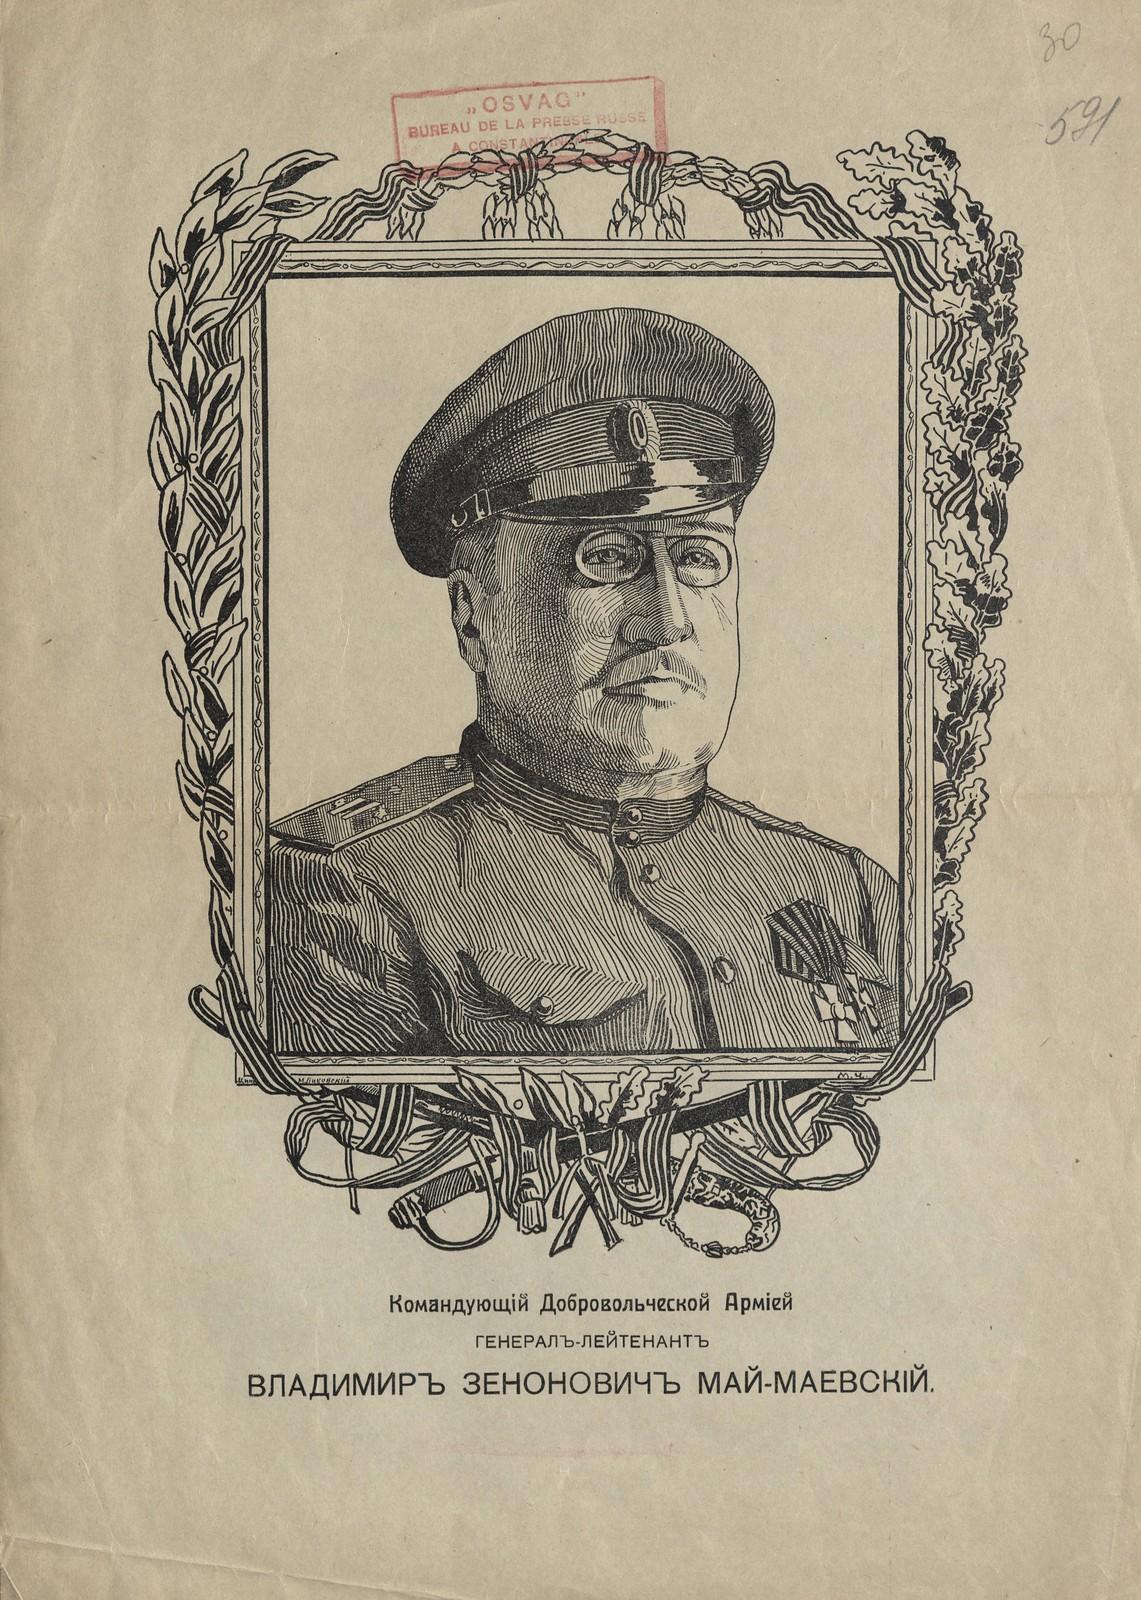 504. Генерал-Лейтенант Владимир Зенонович Май-Маевский